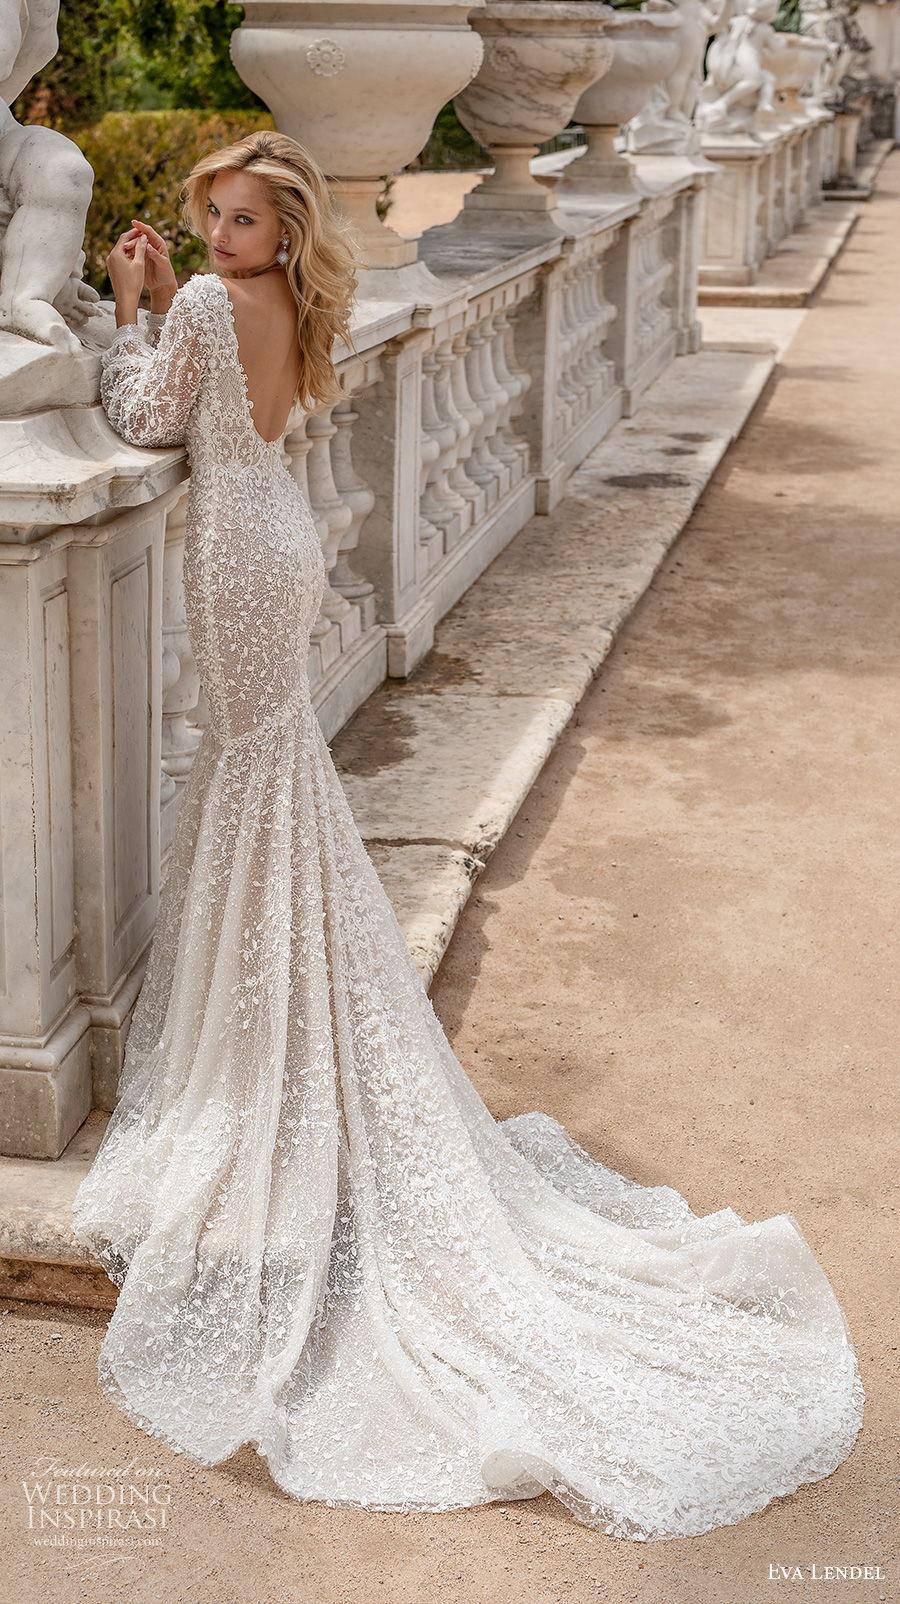 eva lendel 2020 lisbon vibes bridal long bishop sleeves v neck full embellishment sexy elegant mermaid wedding dress v back chapel train (15) bv